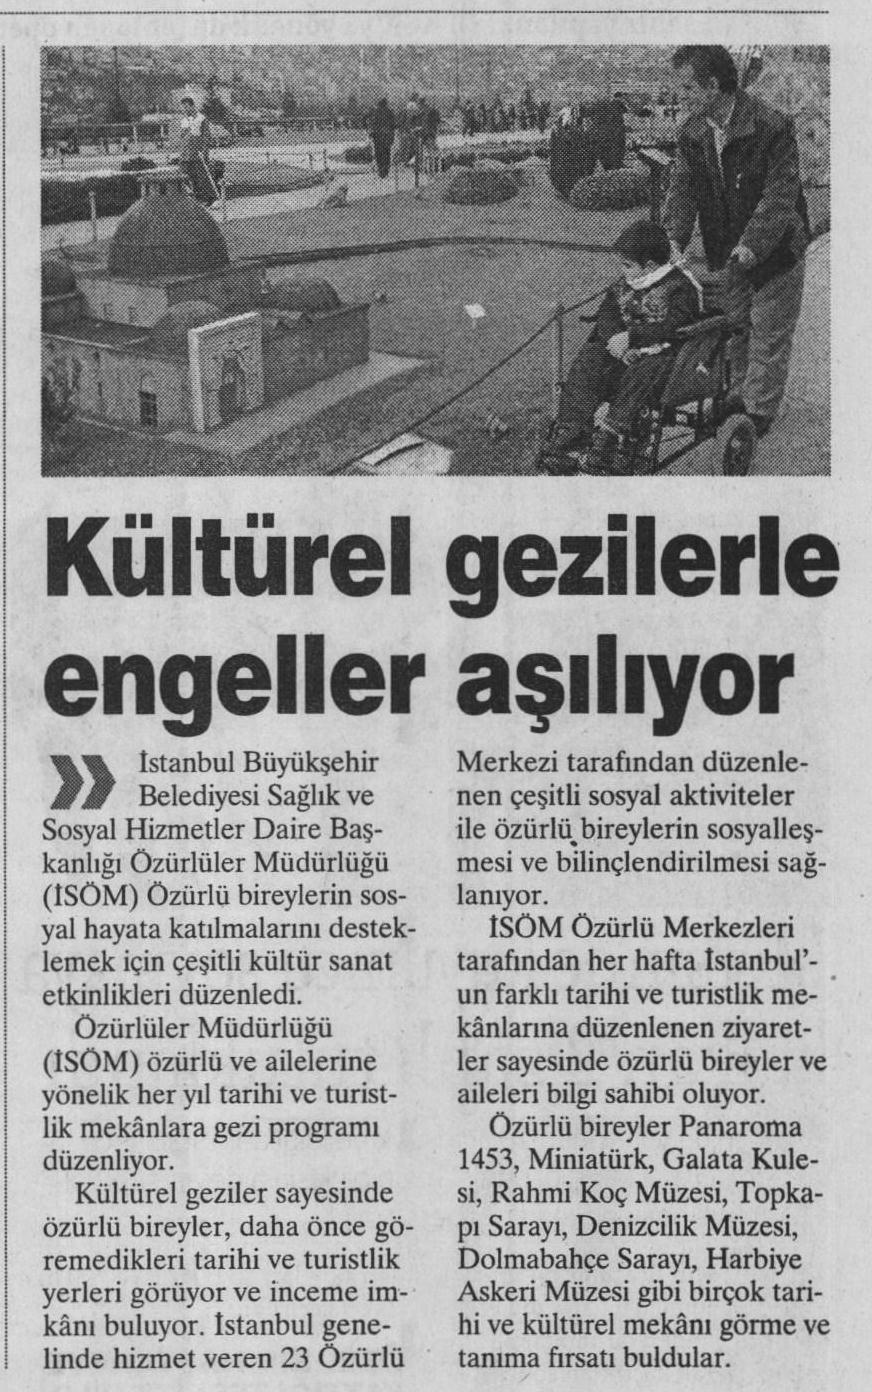 26.12.2012_yenisoz_engelli_gezi